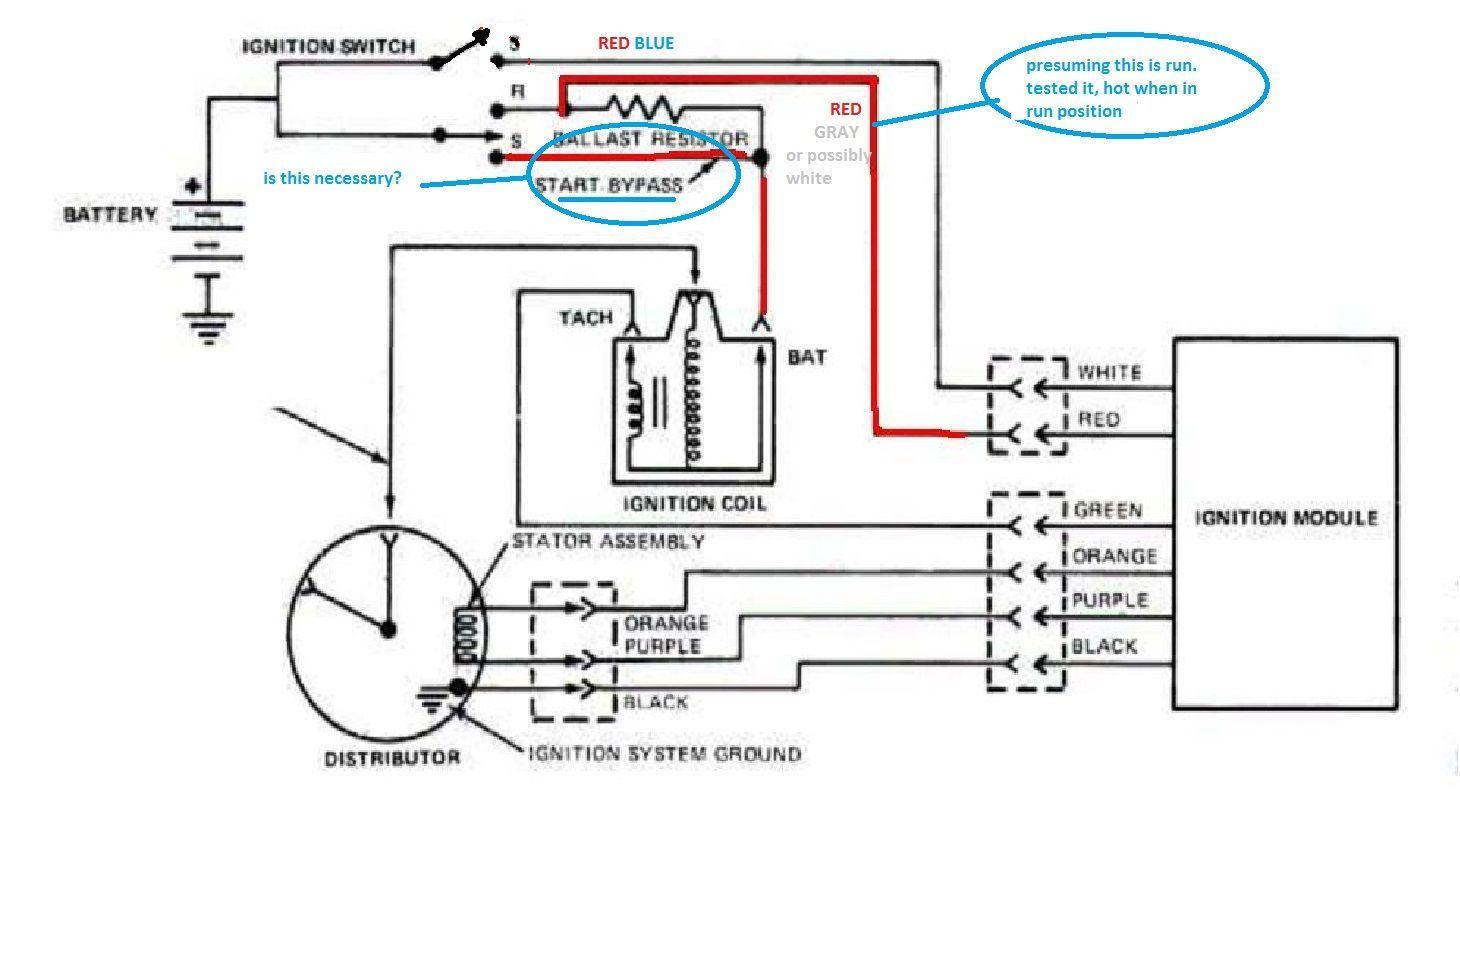 Wiring Diagram Of Motorcycle - bookingritzcarlton.info | Motorcycle wiring,  Motorcycle tips, DiagramPinterest